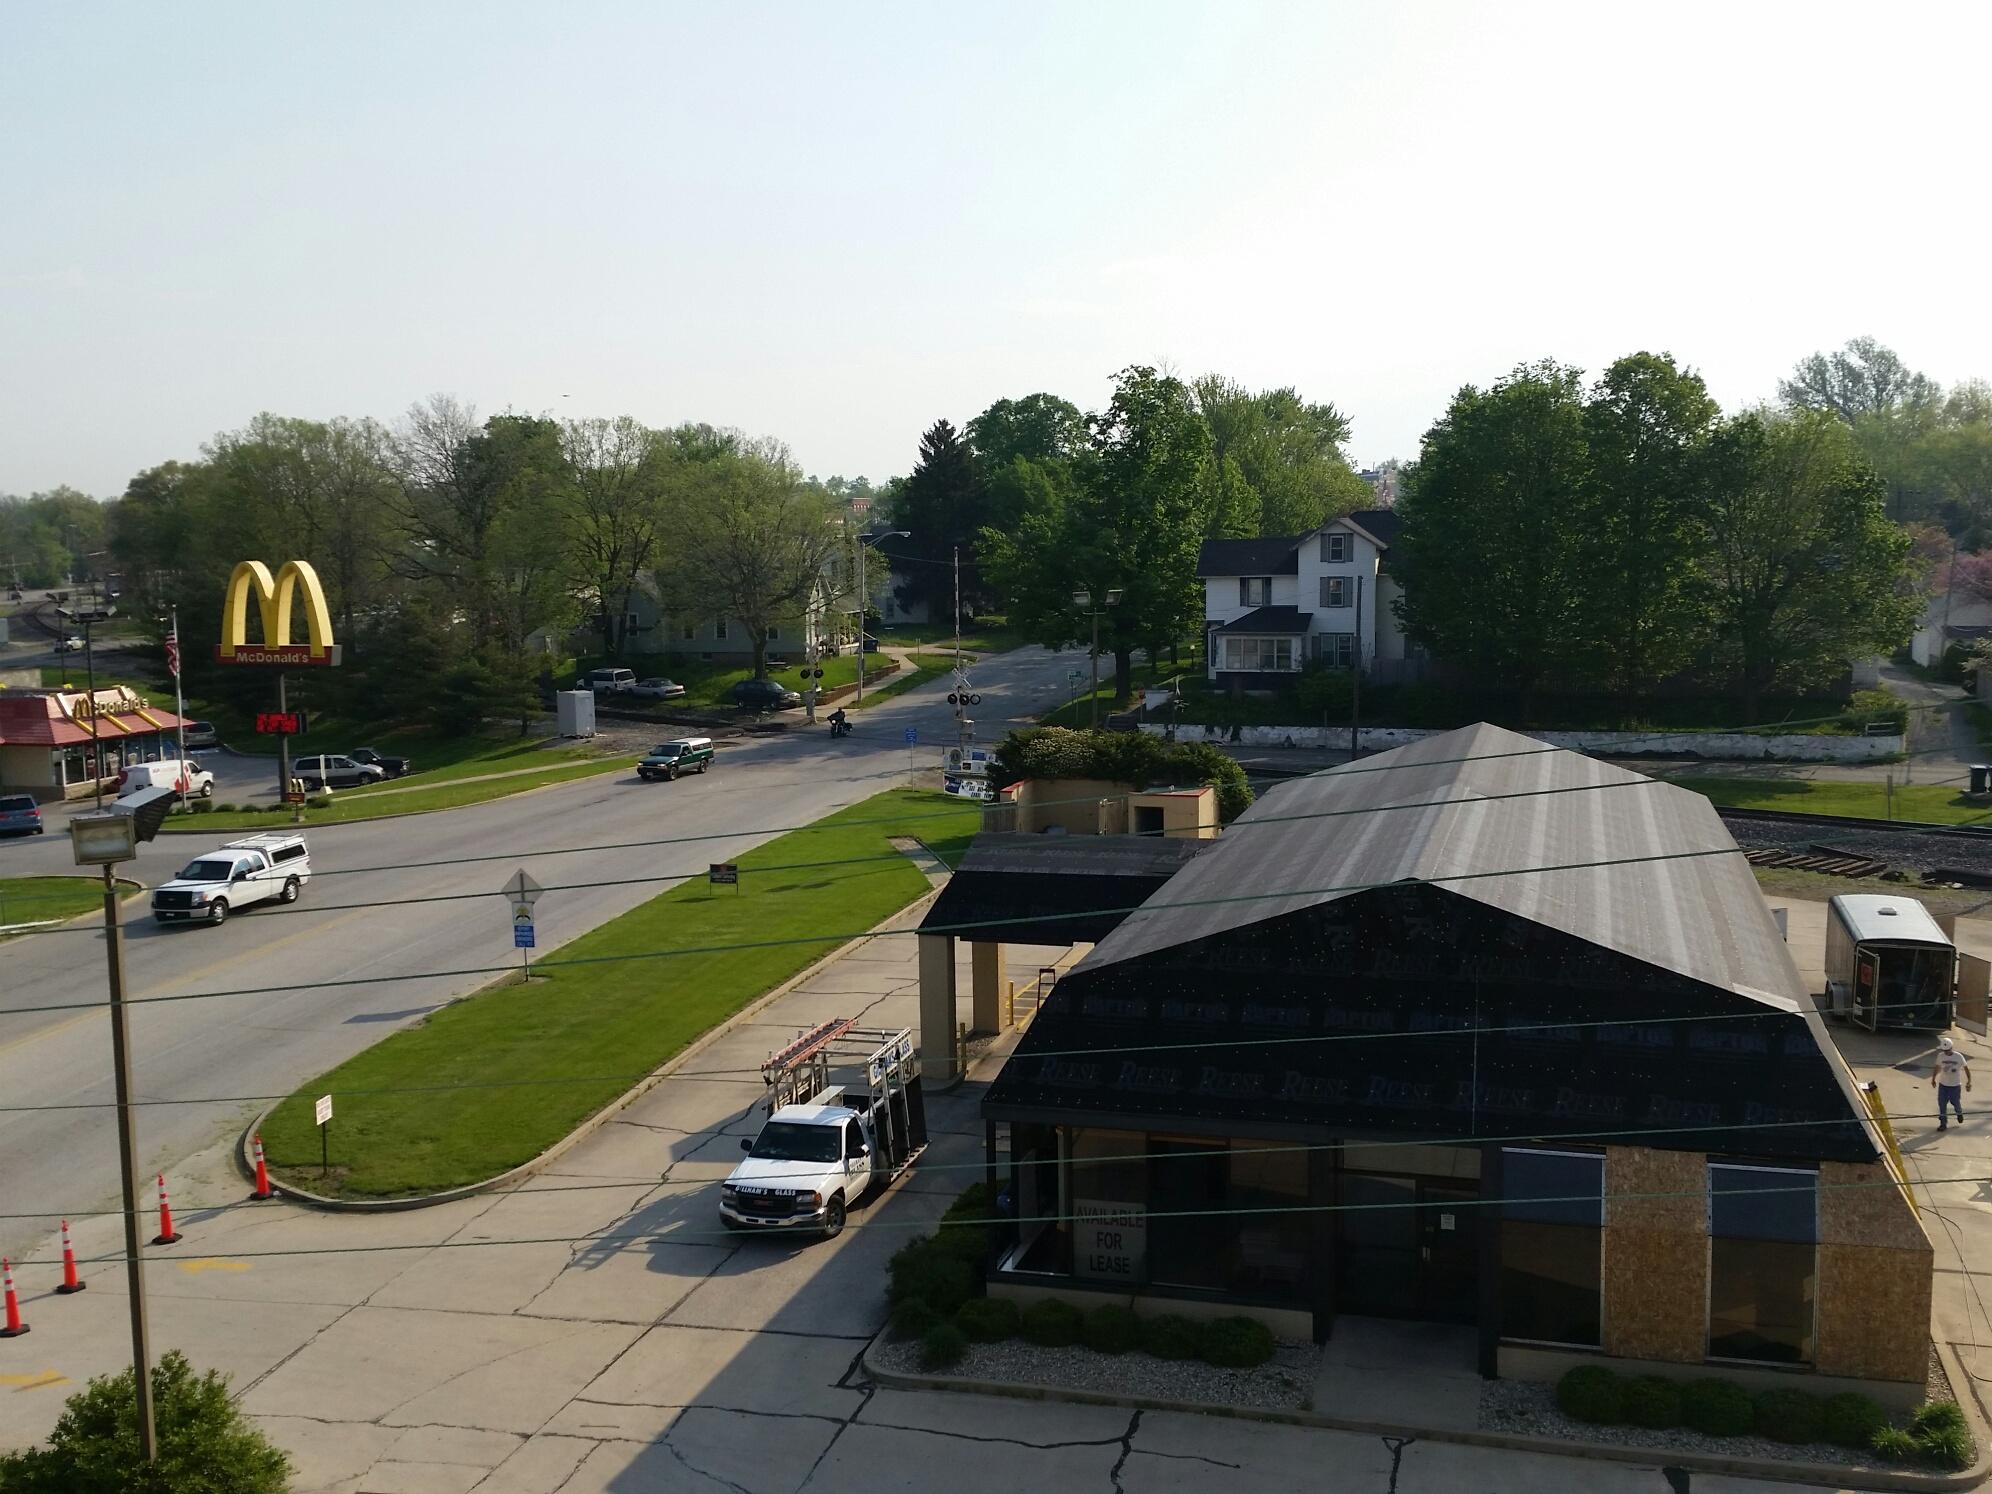 Commercial Building Rennovation